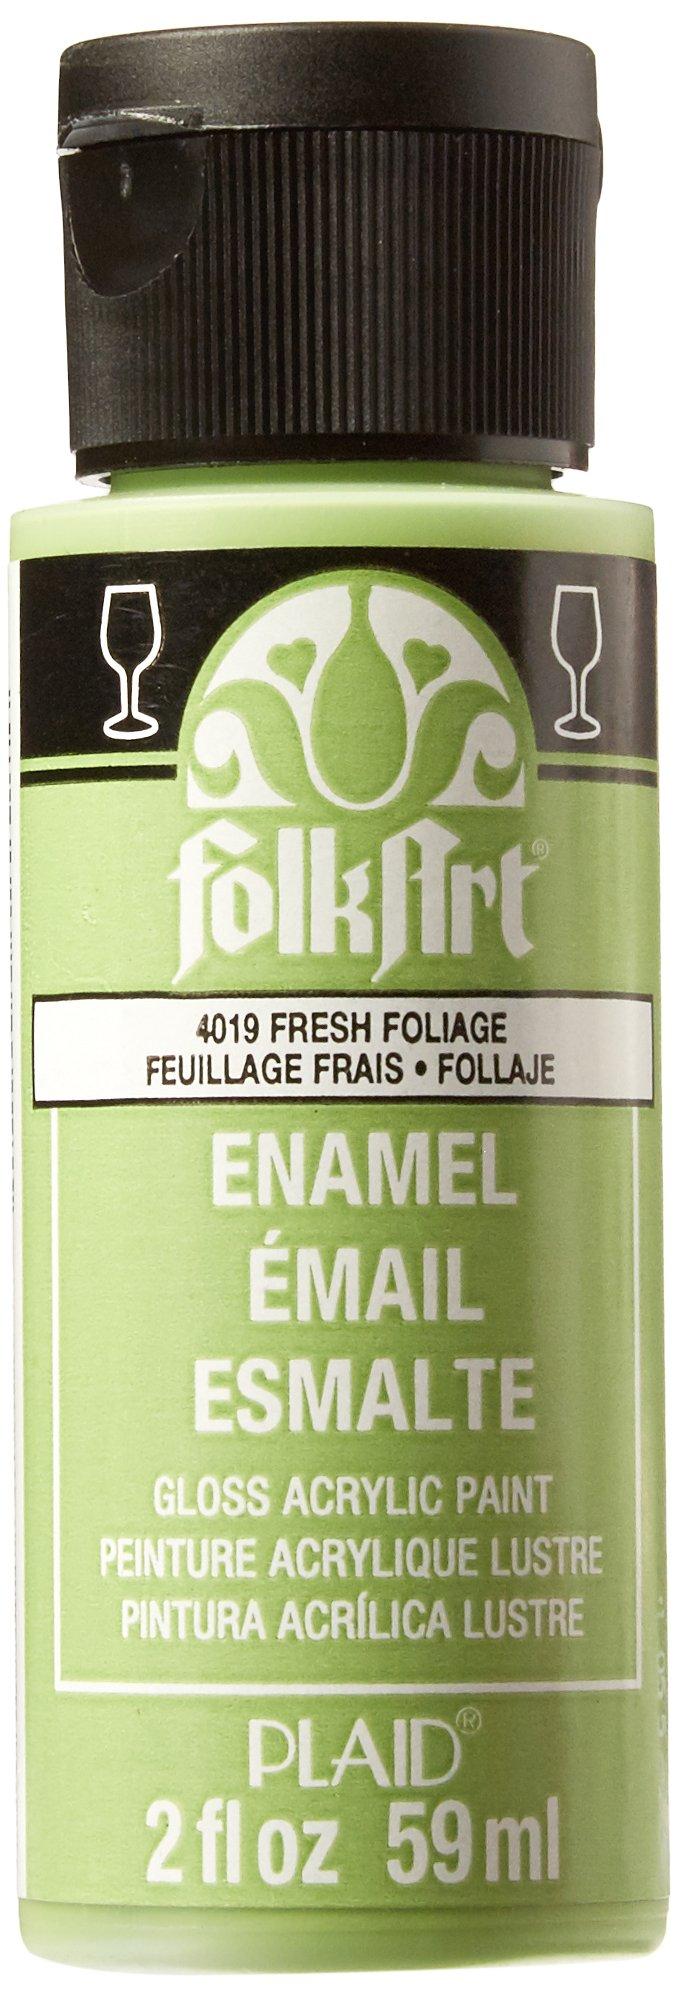 FolkArt Enamel Glass & Ceramic Paint in Assorted Colors (2 oz), 4019, Fresh Foliage